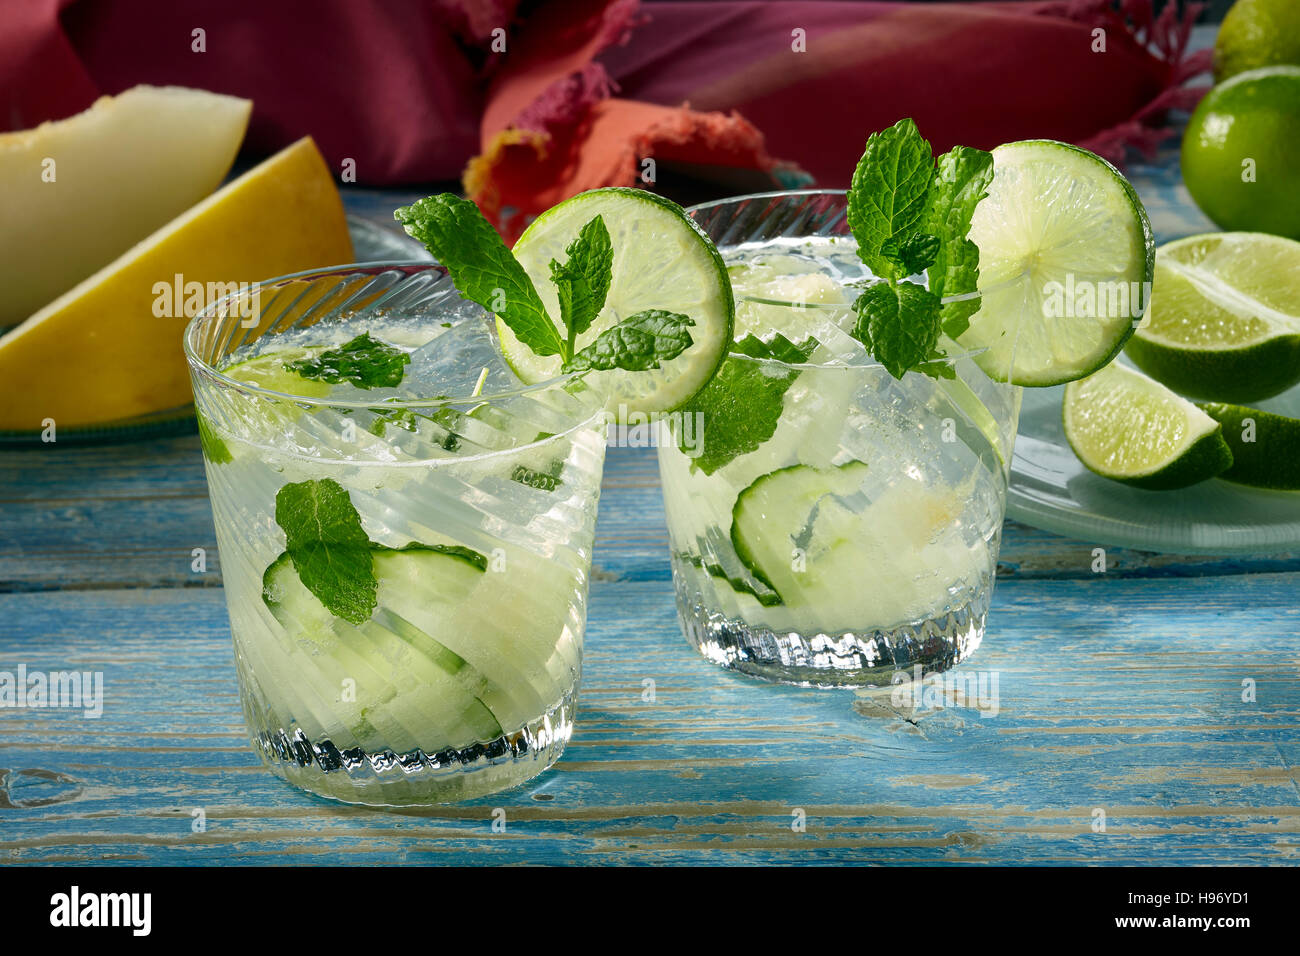 Honeydew aqua fresca - Stock Image